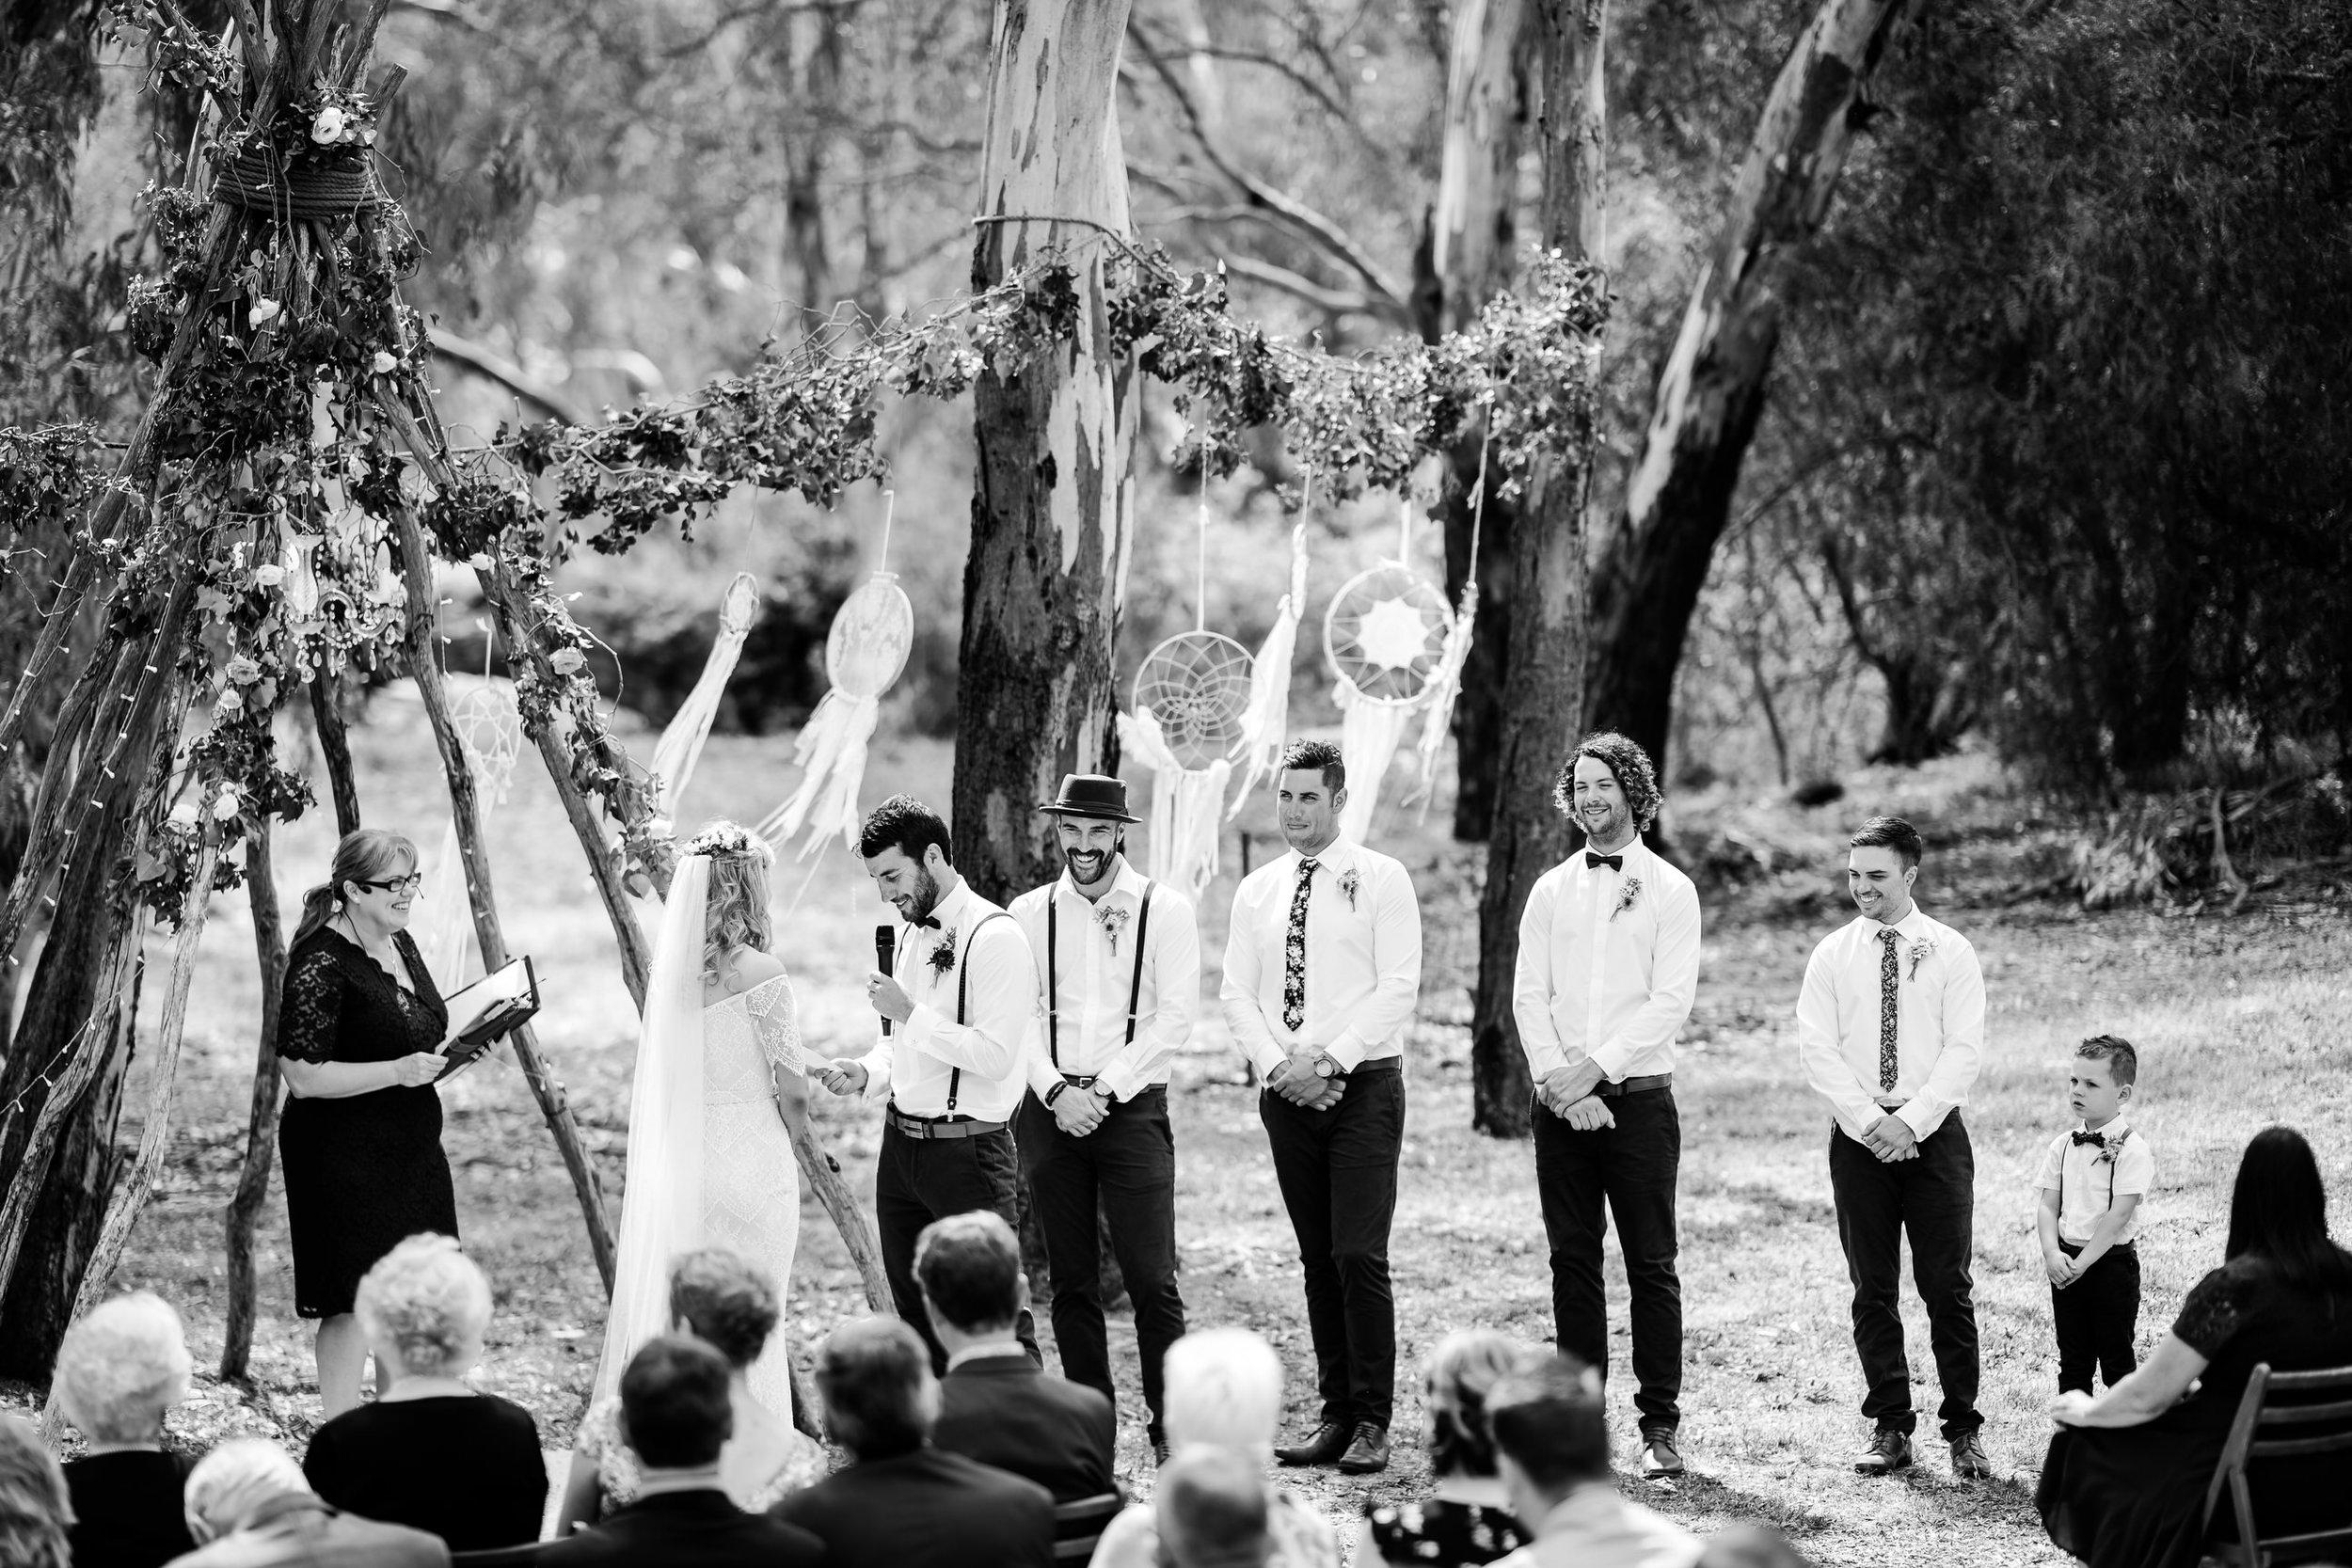 Justin_And_Jim_Photography_Backyard_Wedding175.JPG